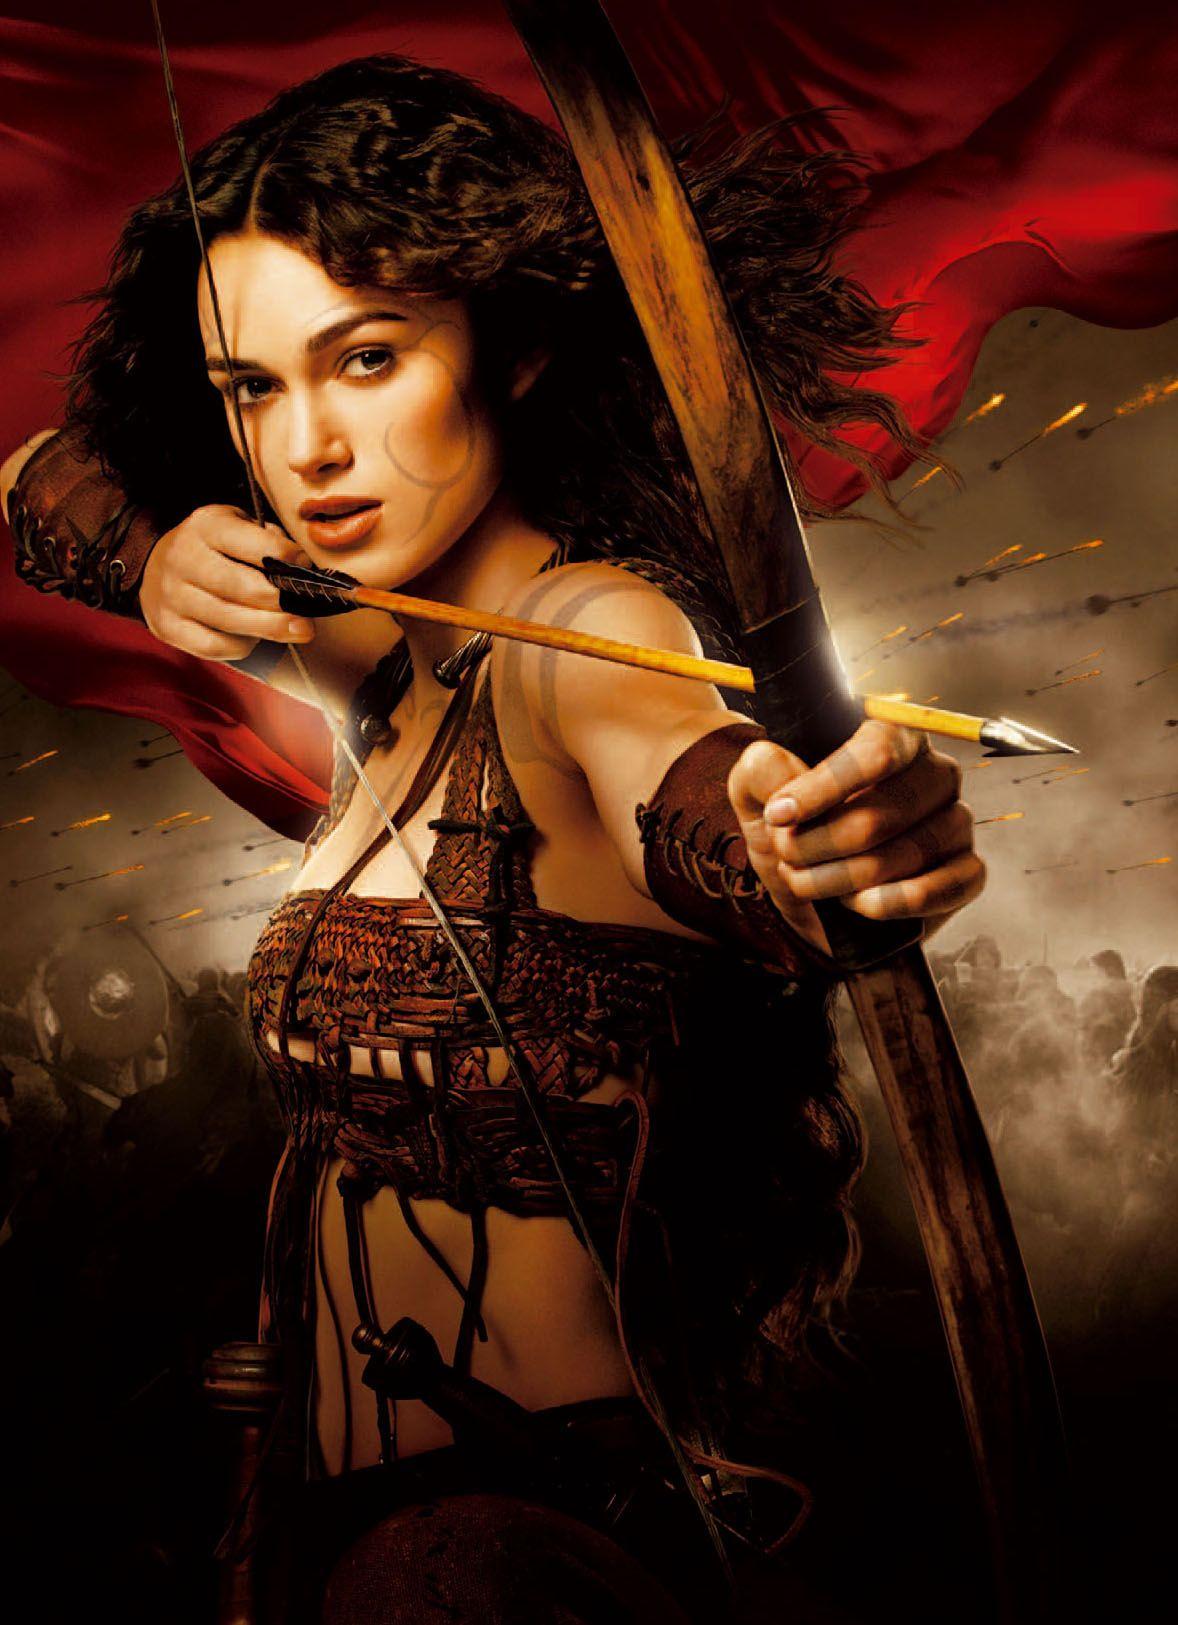 King Arthur 2004 Movie Key Art King Arthur In 2019 Artemis